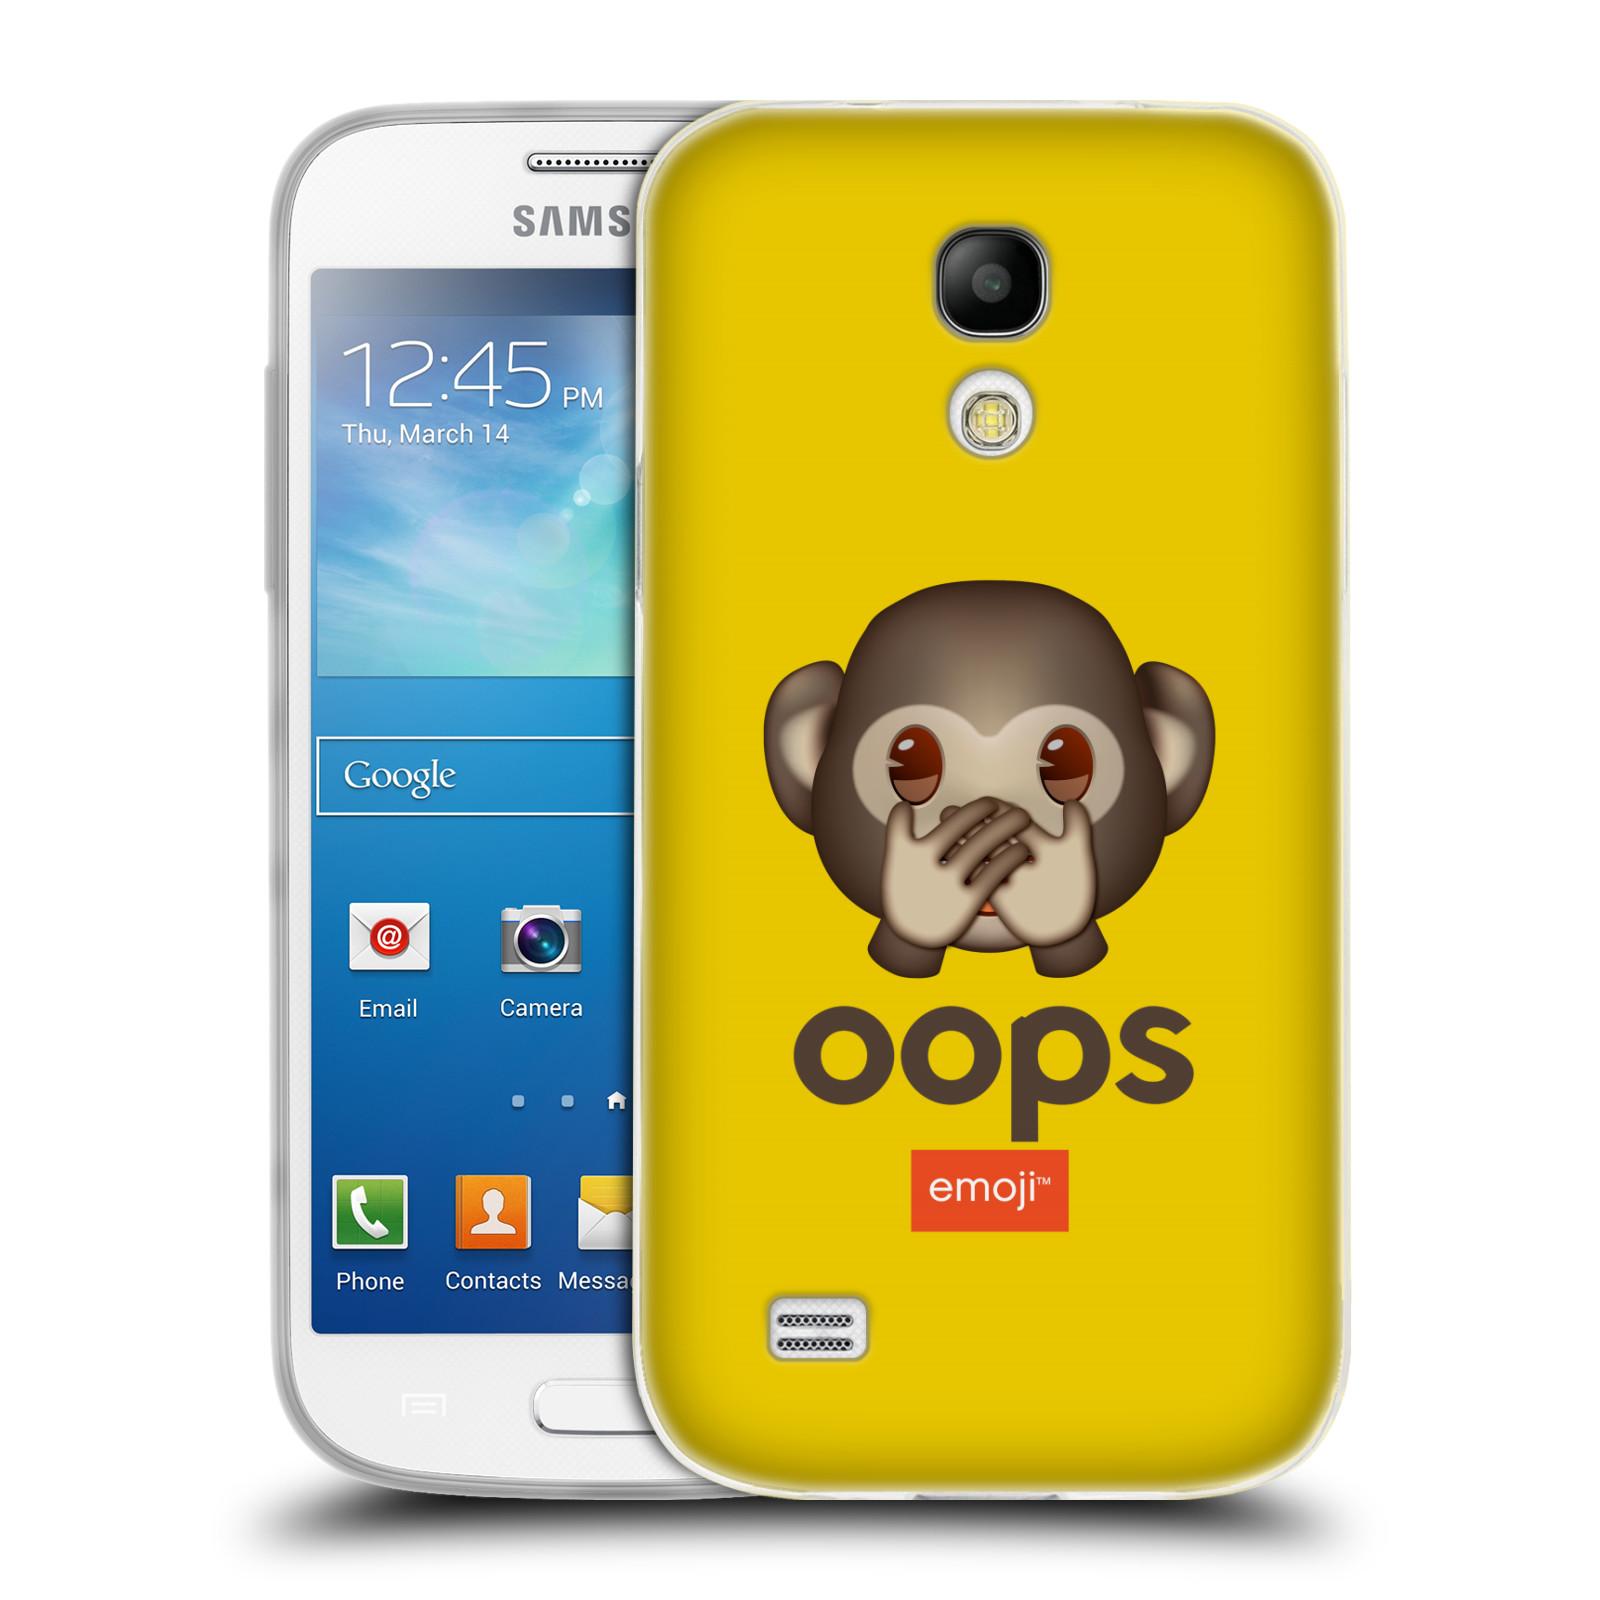 5179c7349 Silikonové pouzdro na mobil Samsung Galaxy S4 Mini VE HEAD CASE EMOJI -  Opička OOPS